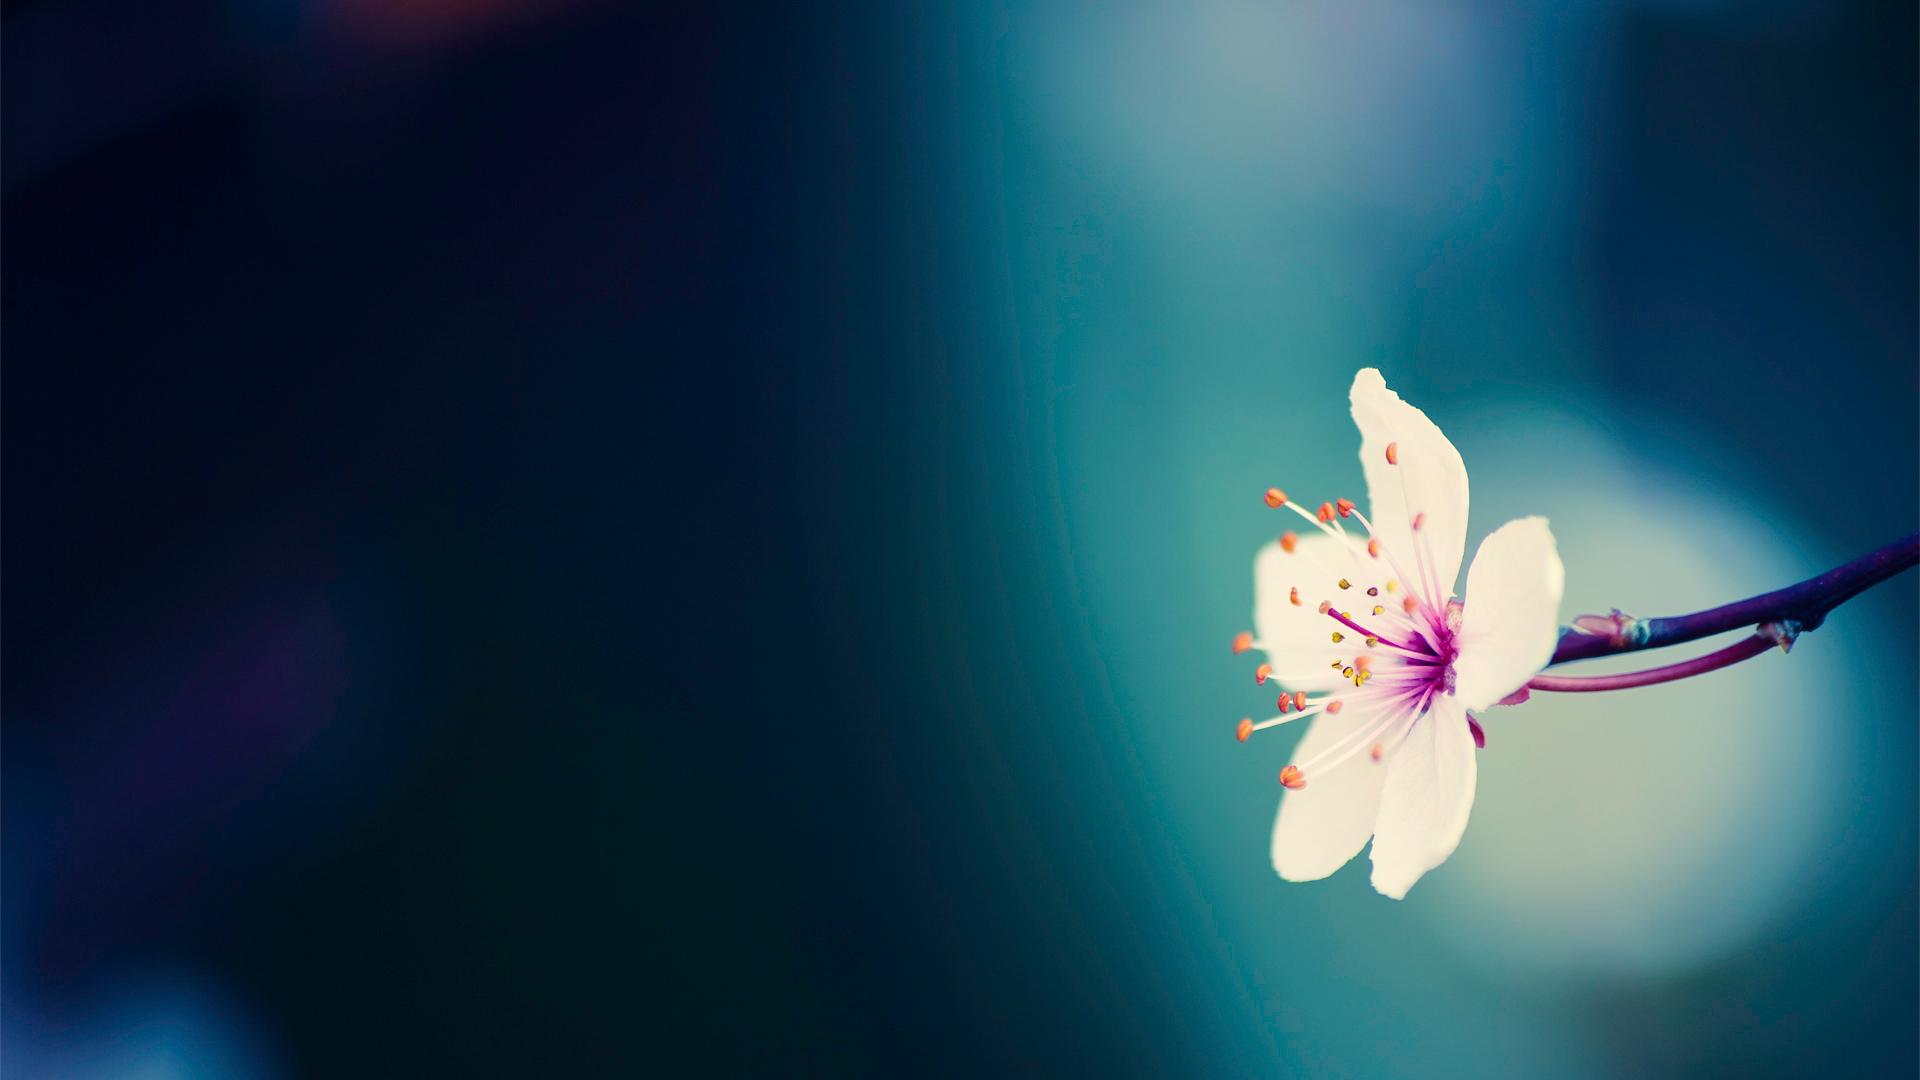 flower wallpaper background - wallpapersafari